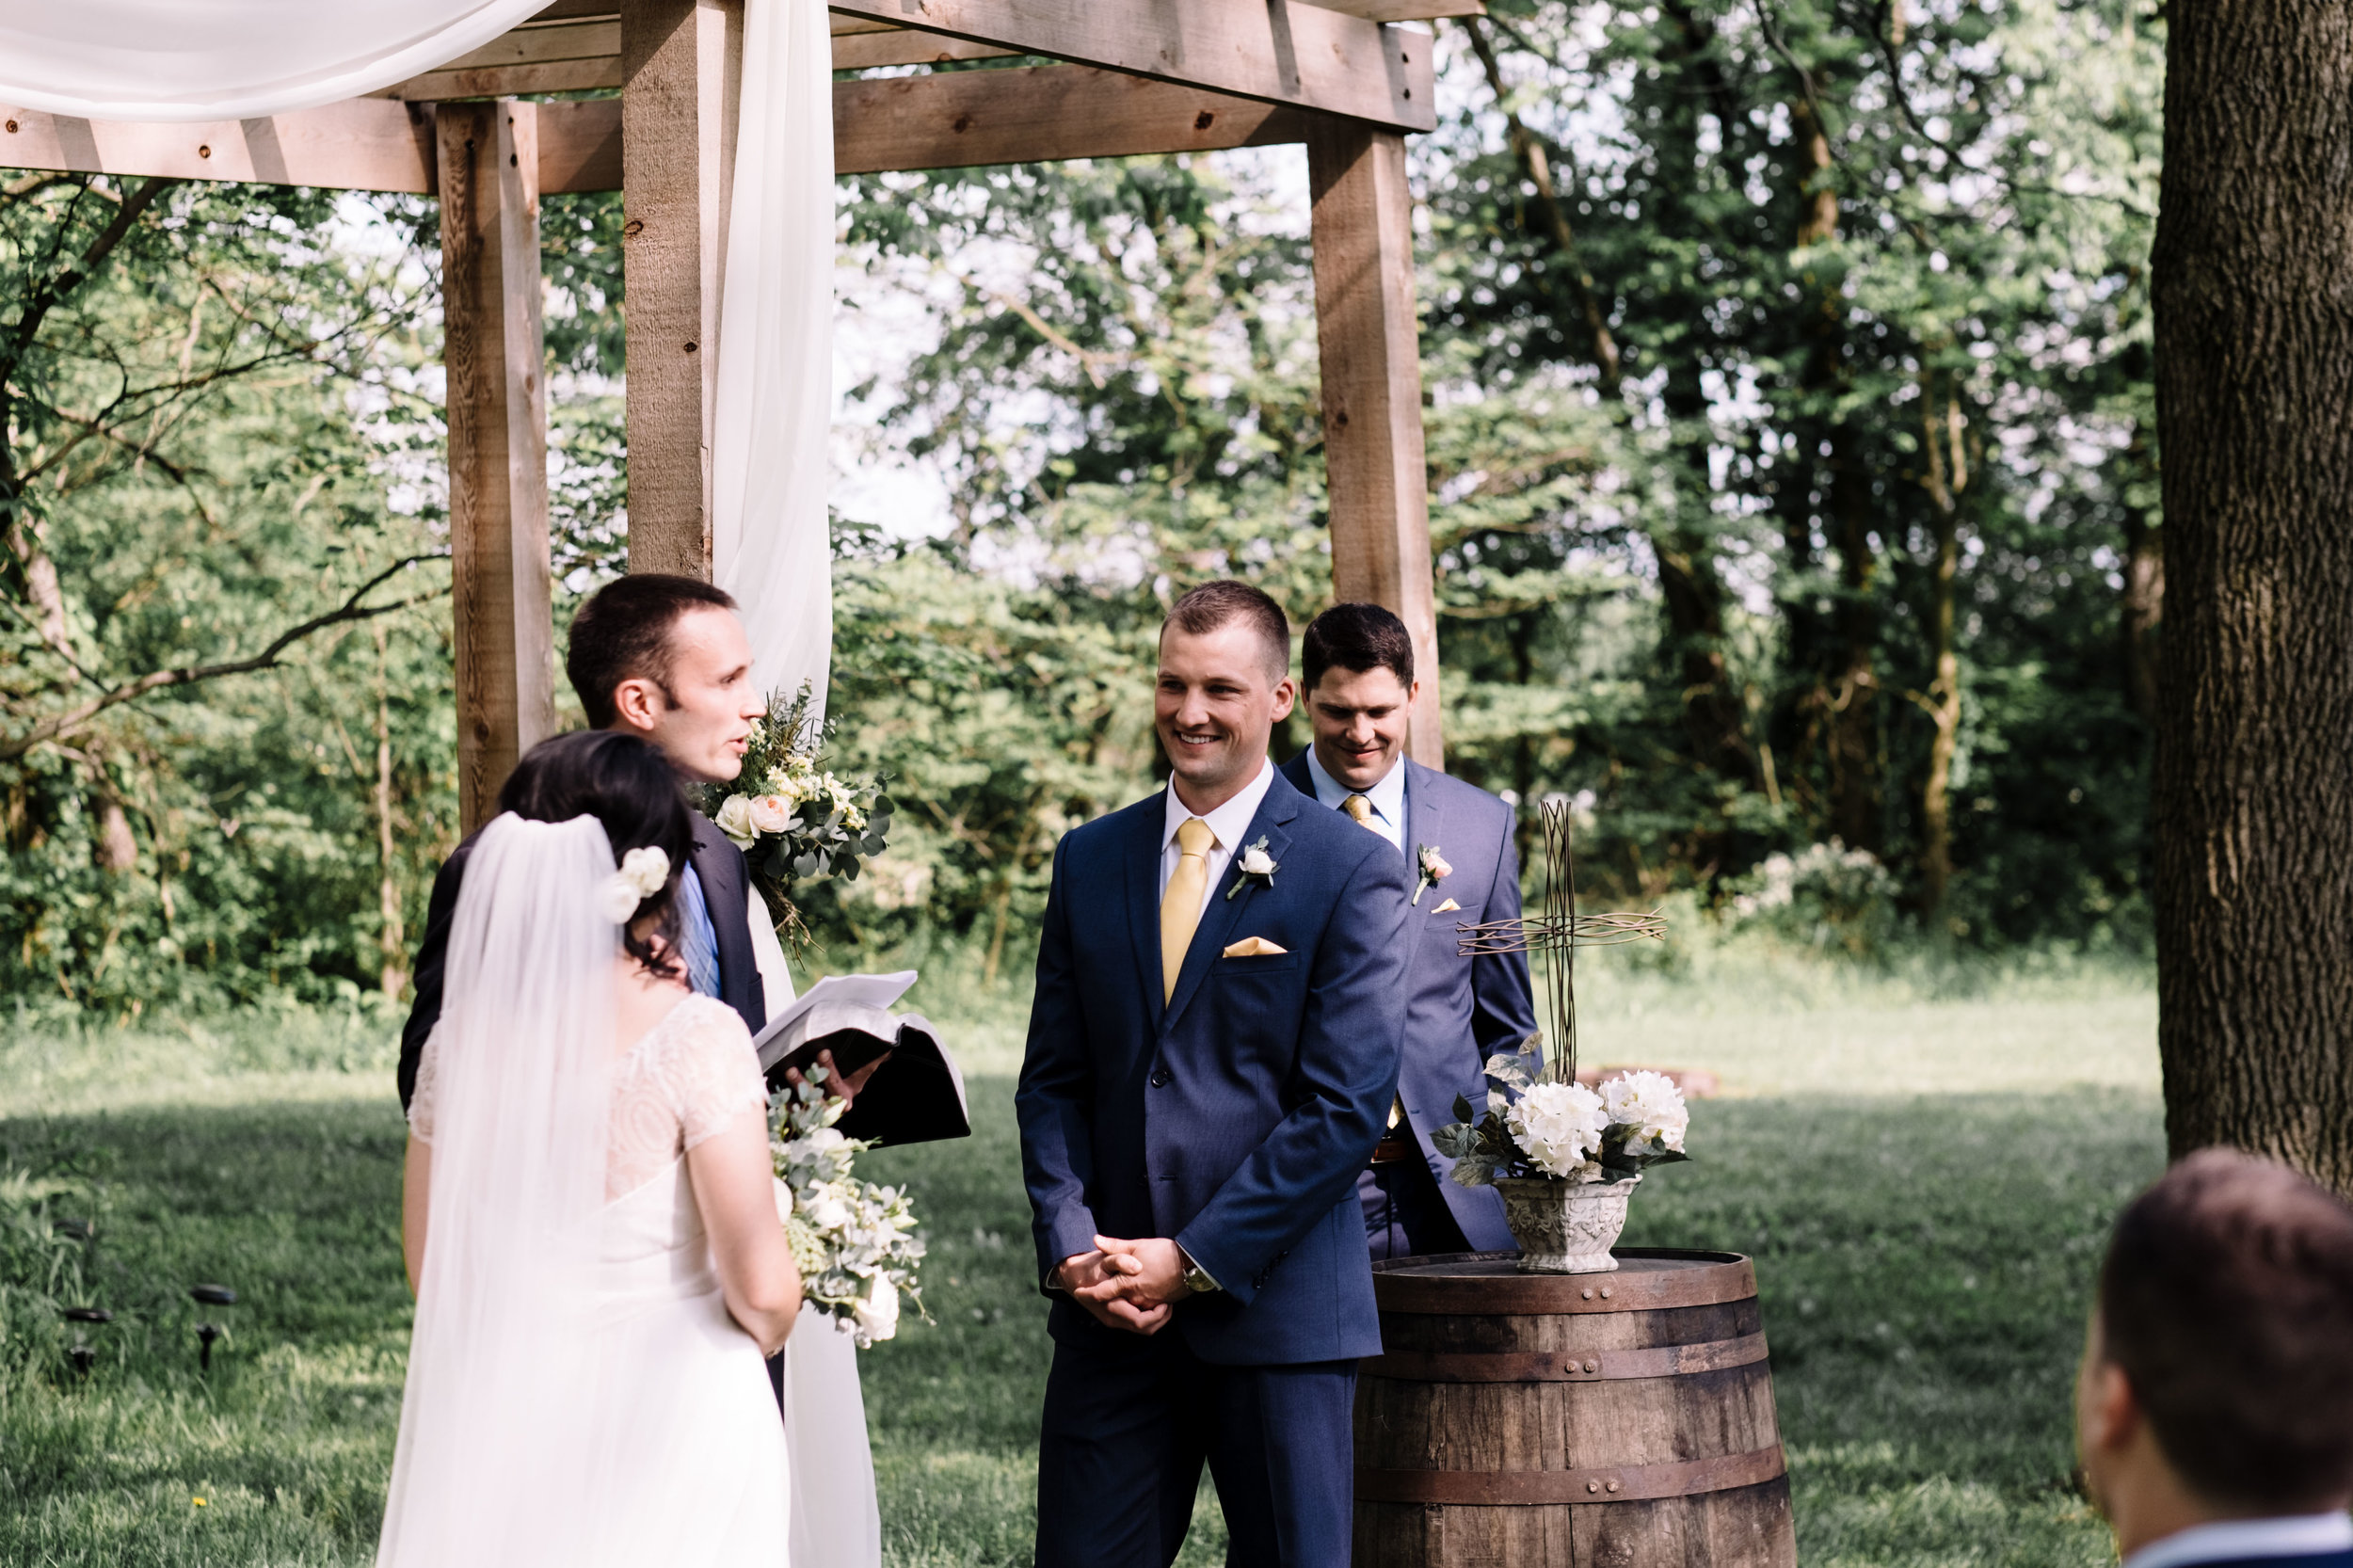 Ana-Dan-Blog-Indianapolis-Wedding-43.jpg